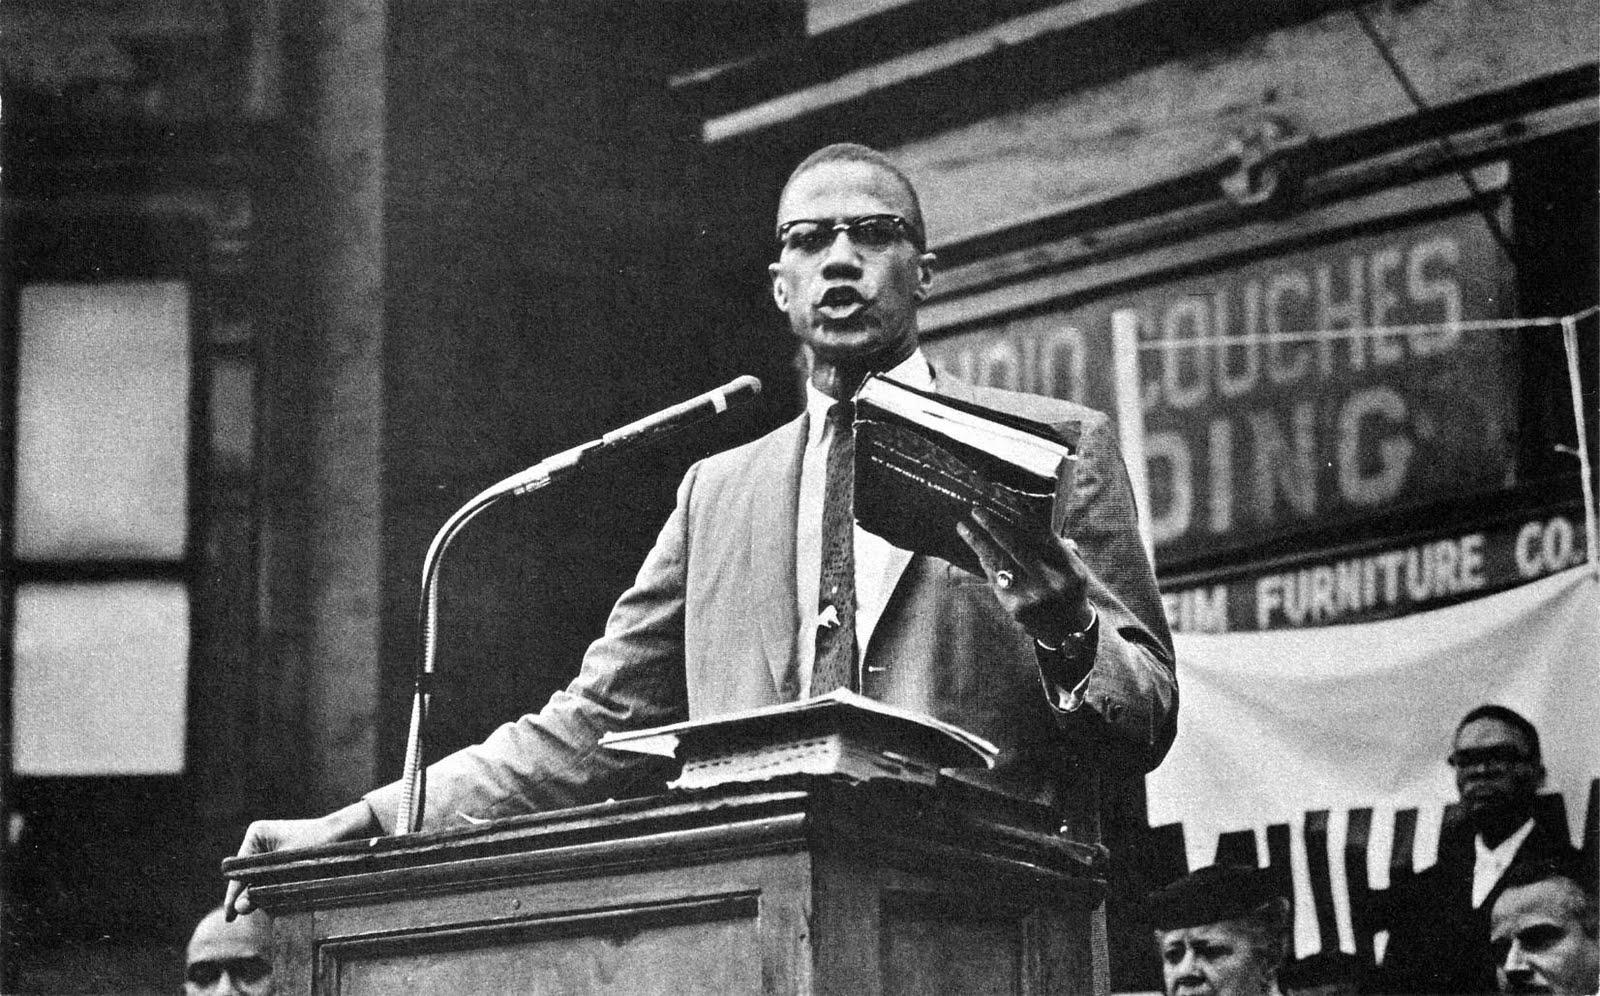 Discursos de Malcolm X